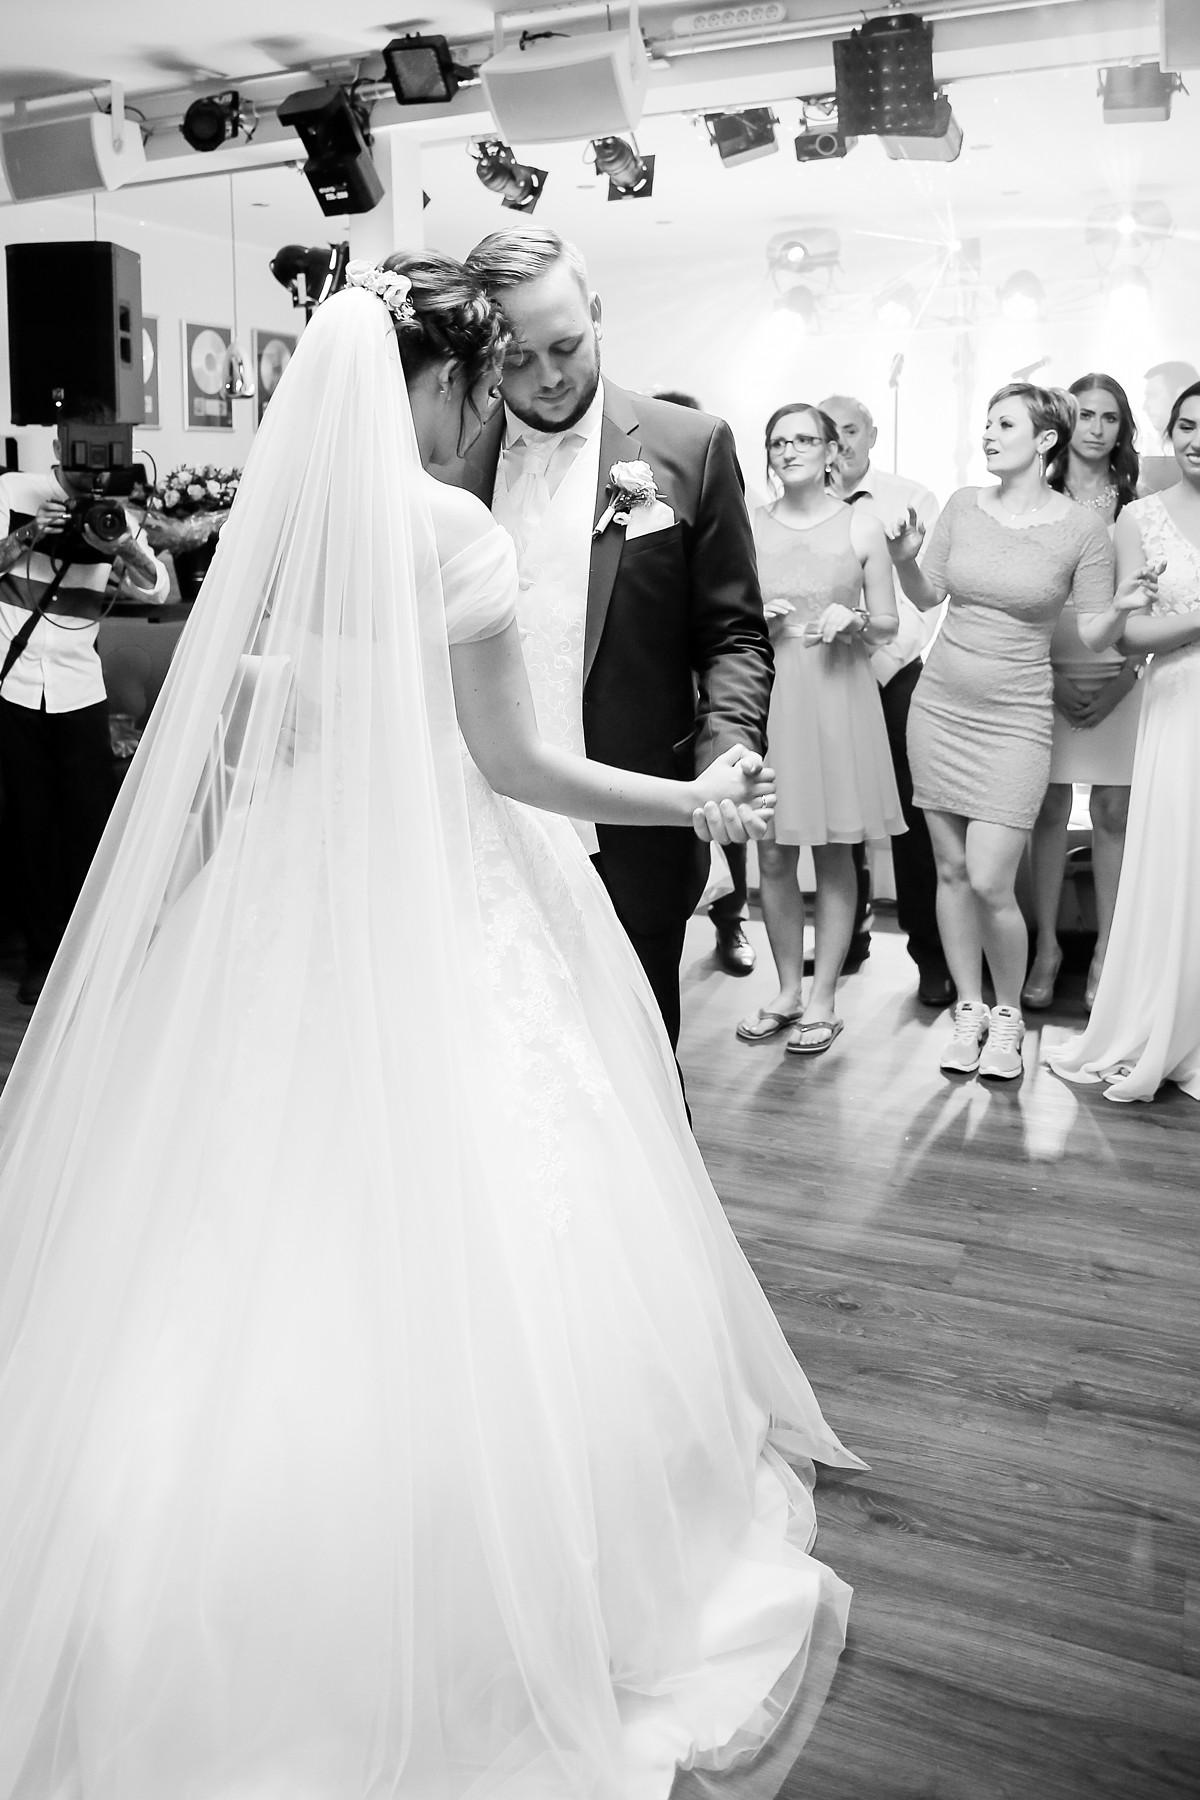 Hochzeitsfotograf-Bünde-Hücker-Moor-Fotograf-Moor-Ranch_0202